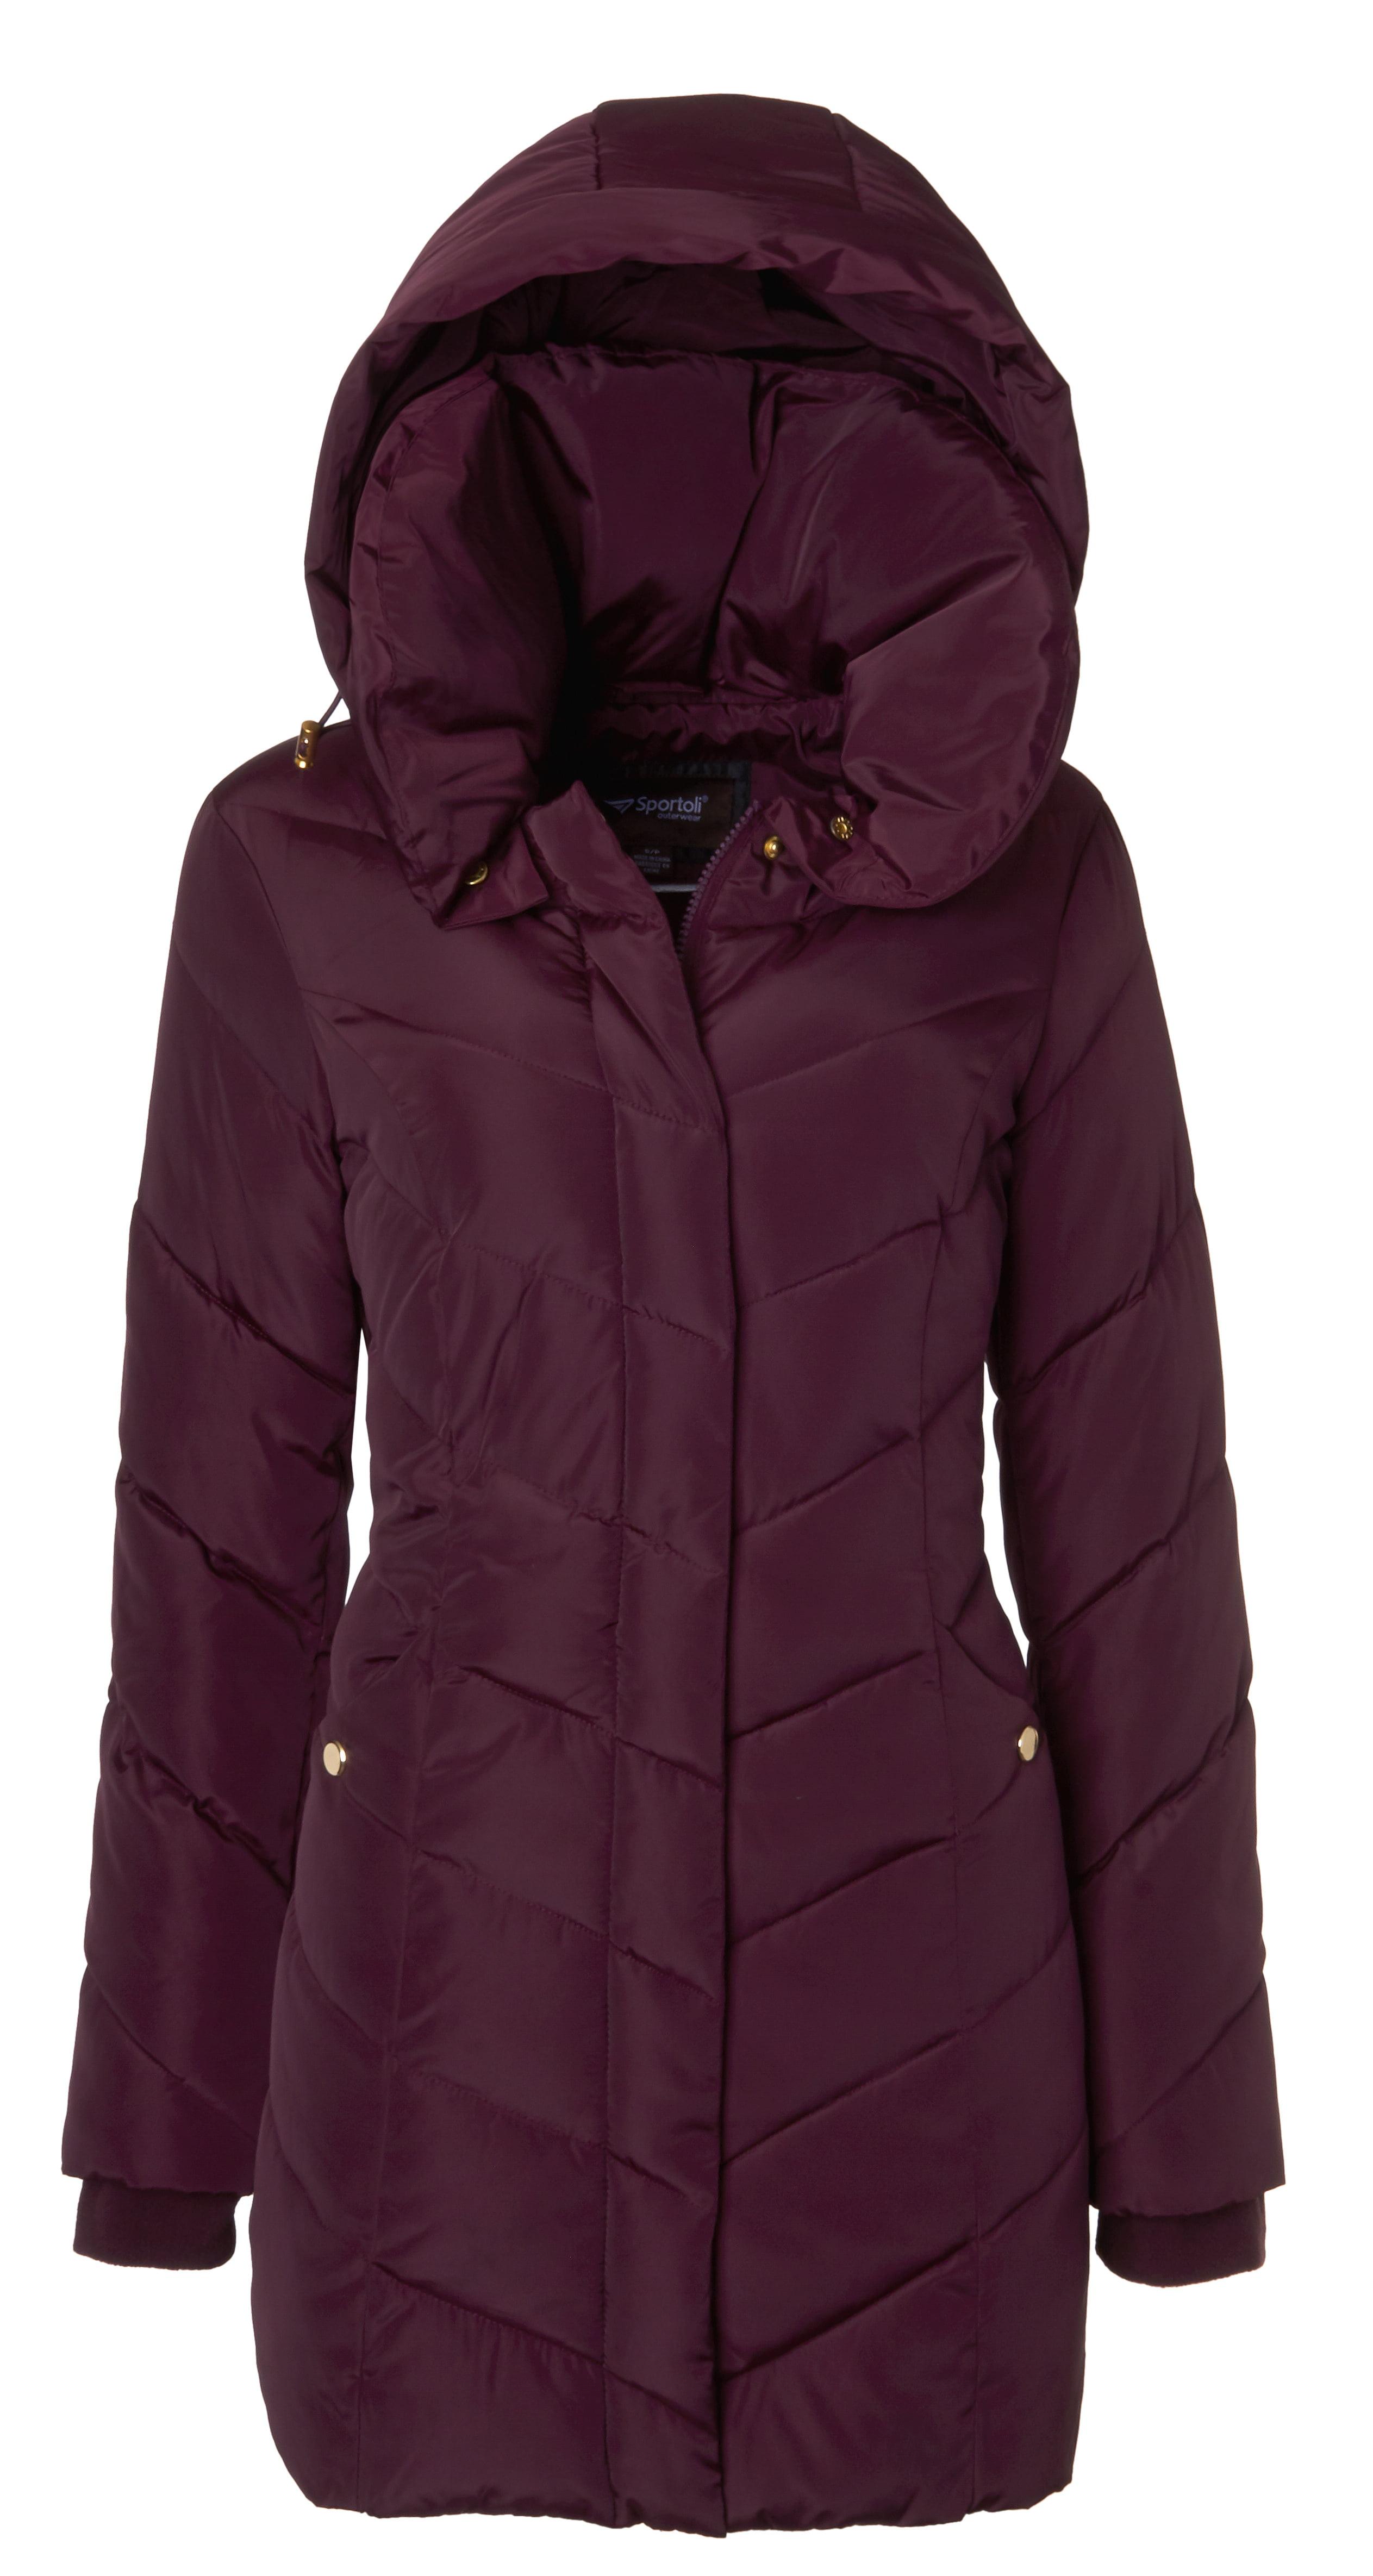 a4ba7b29c788b Sportoli - Sportoli Womens Winter Fleece Lined Chevron Quilted Puffer  Jacket Coat with Hood - Merlot (Size 3X ) - Walmart.com